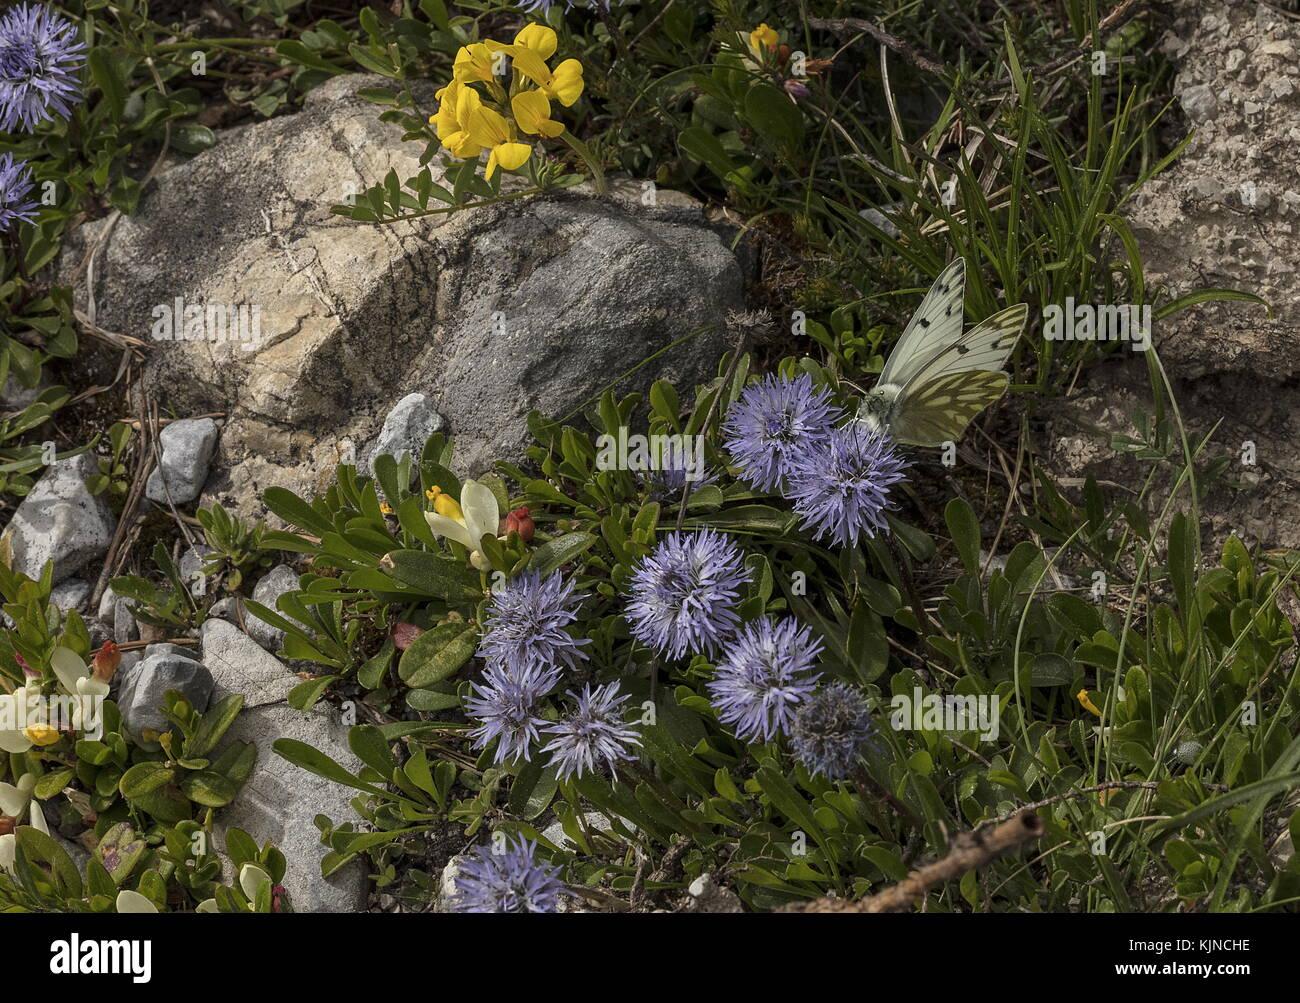 Peak White, Pontia callidice, nectaring on Matted Globularia, Globularia cordifolia, Swiss Alps. - Stock Image